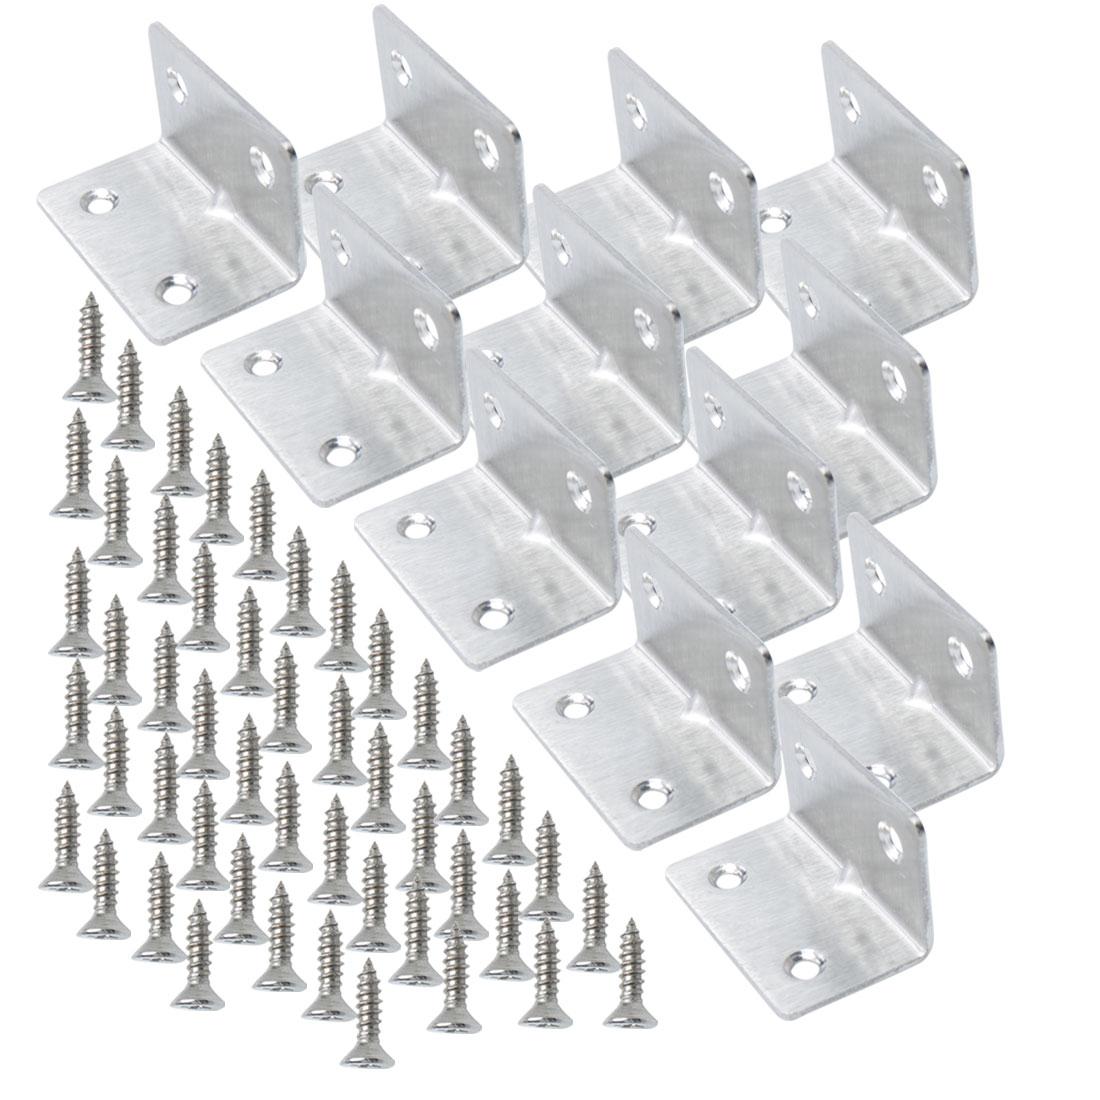 Angle Bracket Stainless Steel Corner Brace Support w Screw 30 x 30 x 50mm, 12pcs